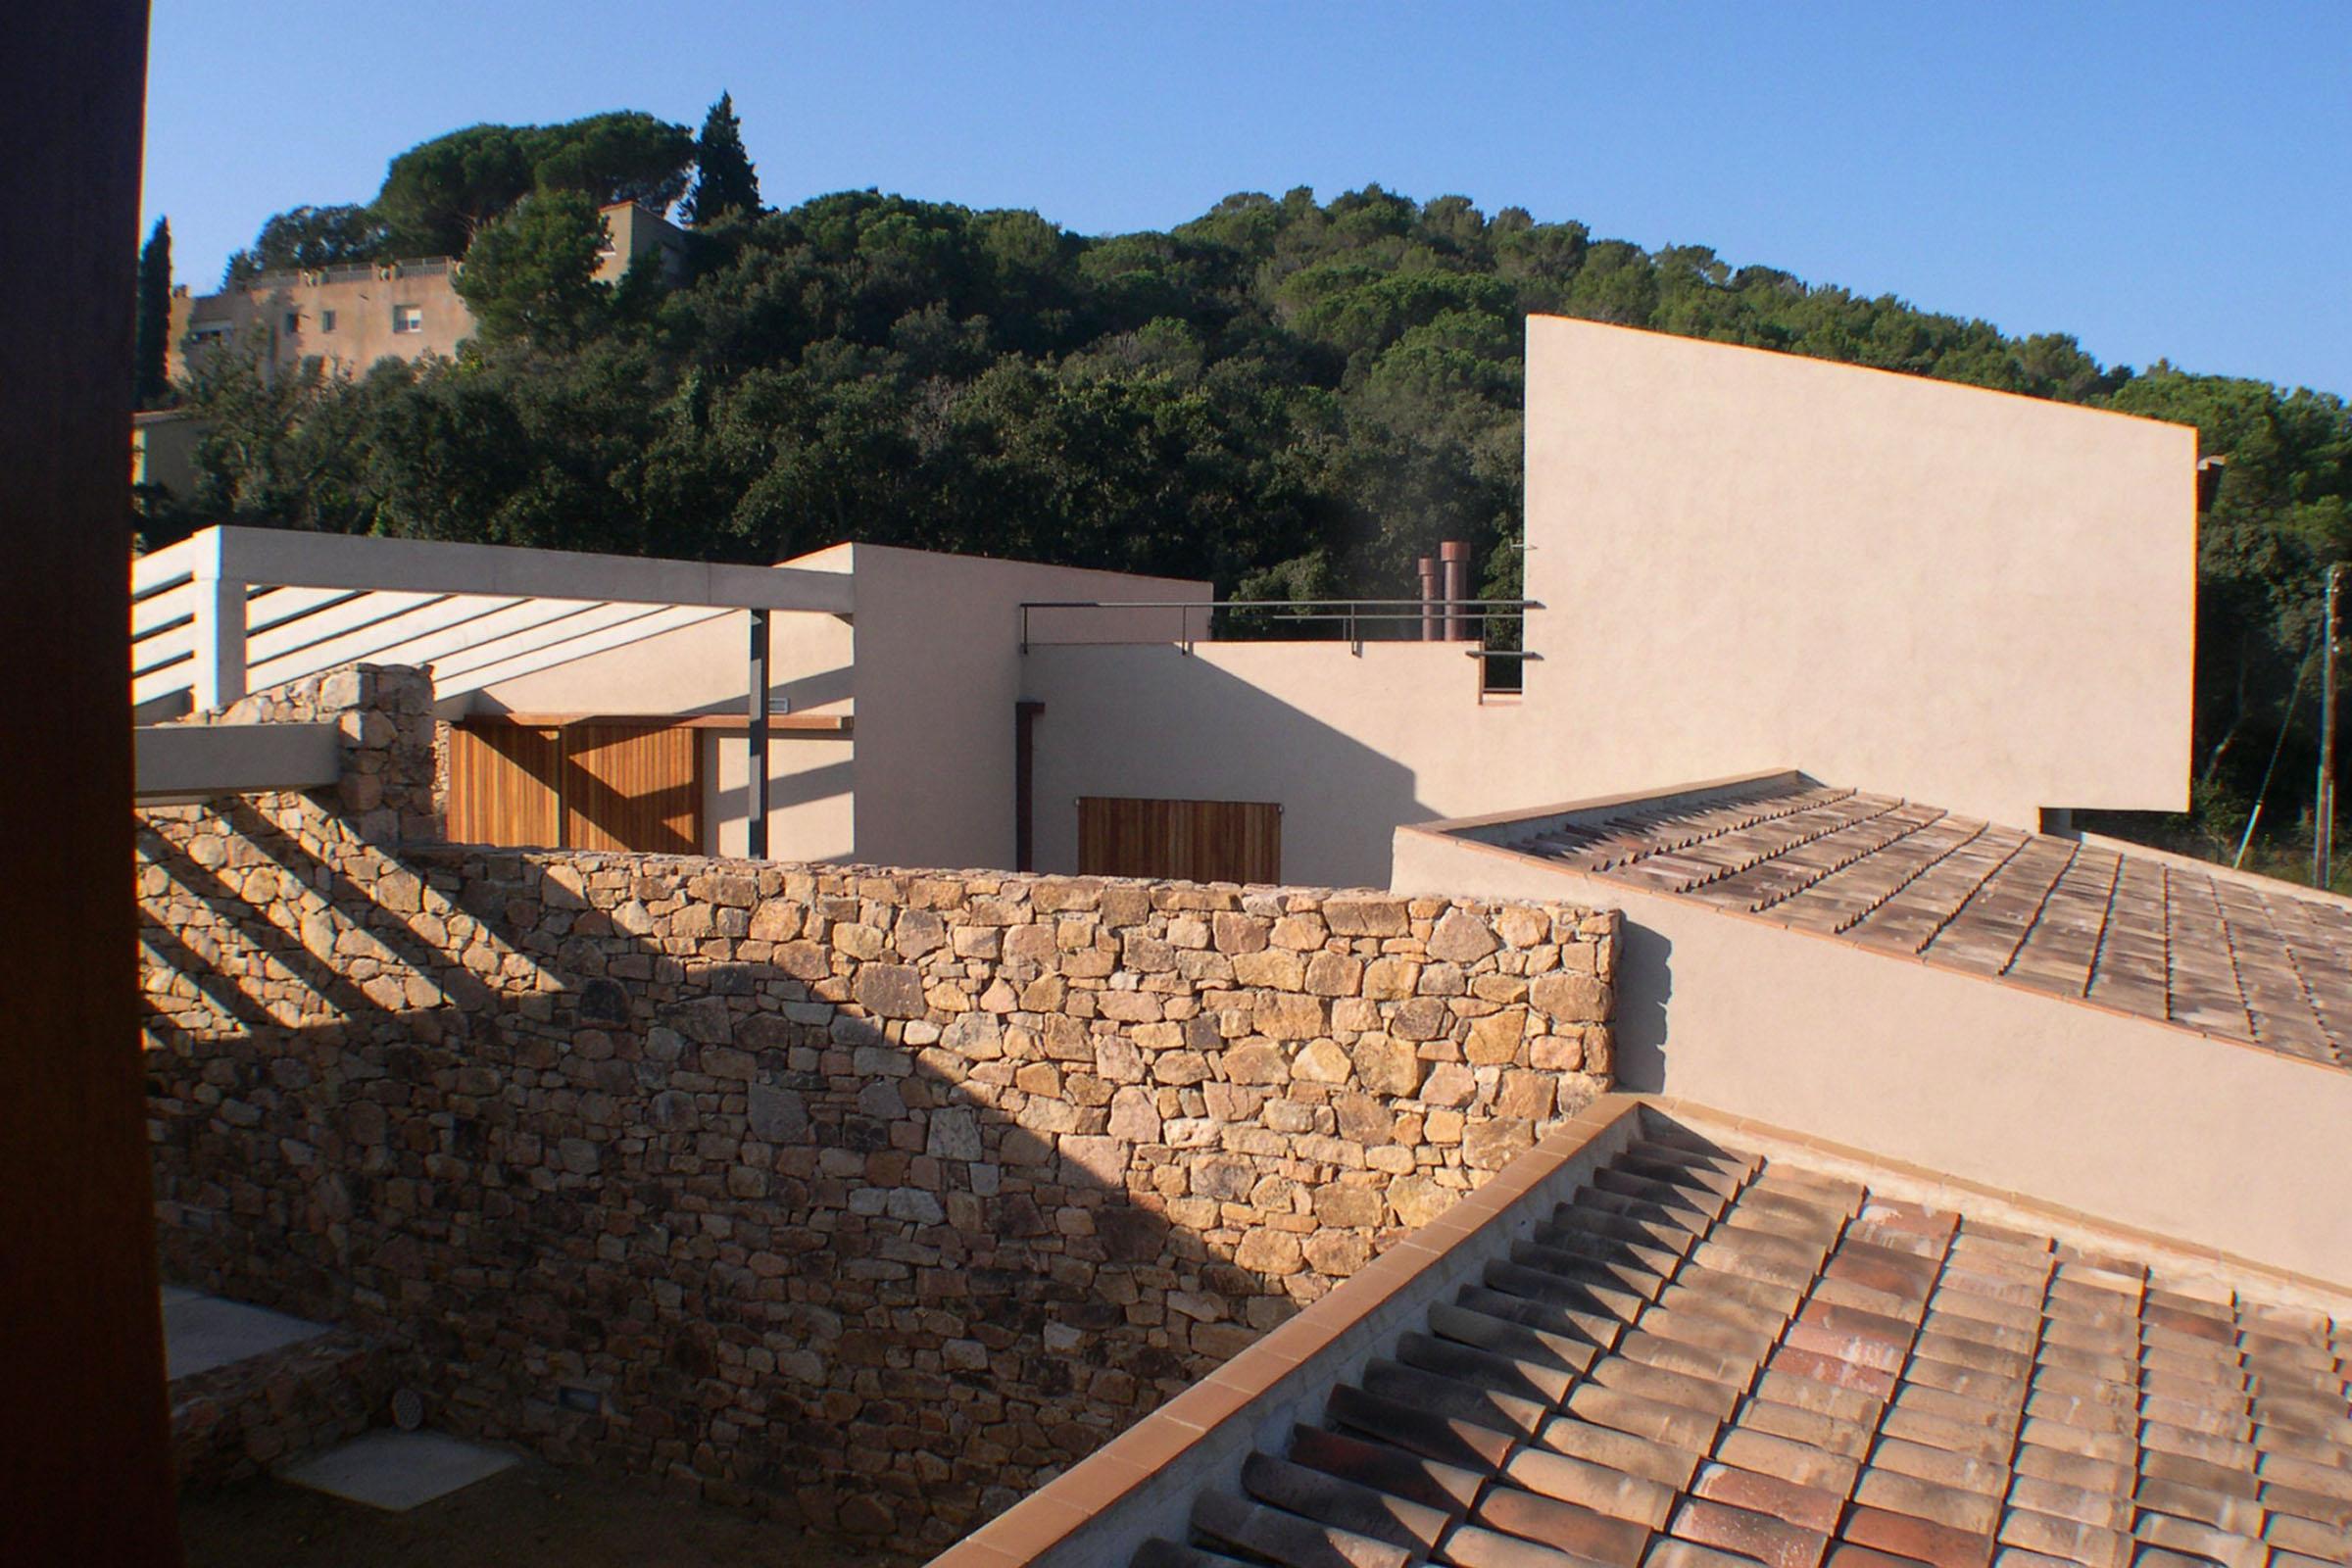 Cantallops Vicente - Arquitectes